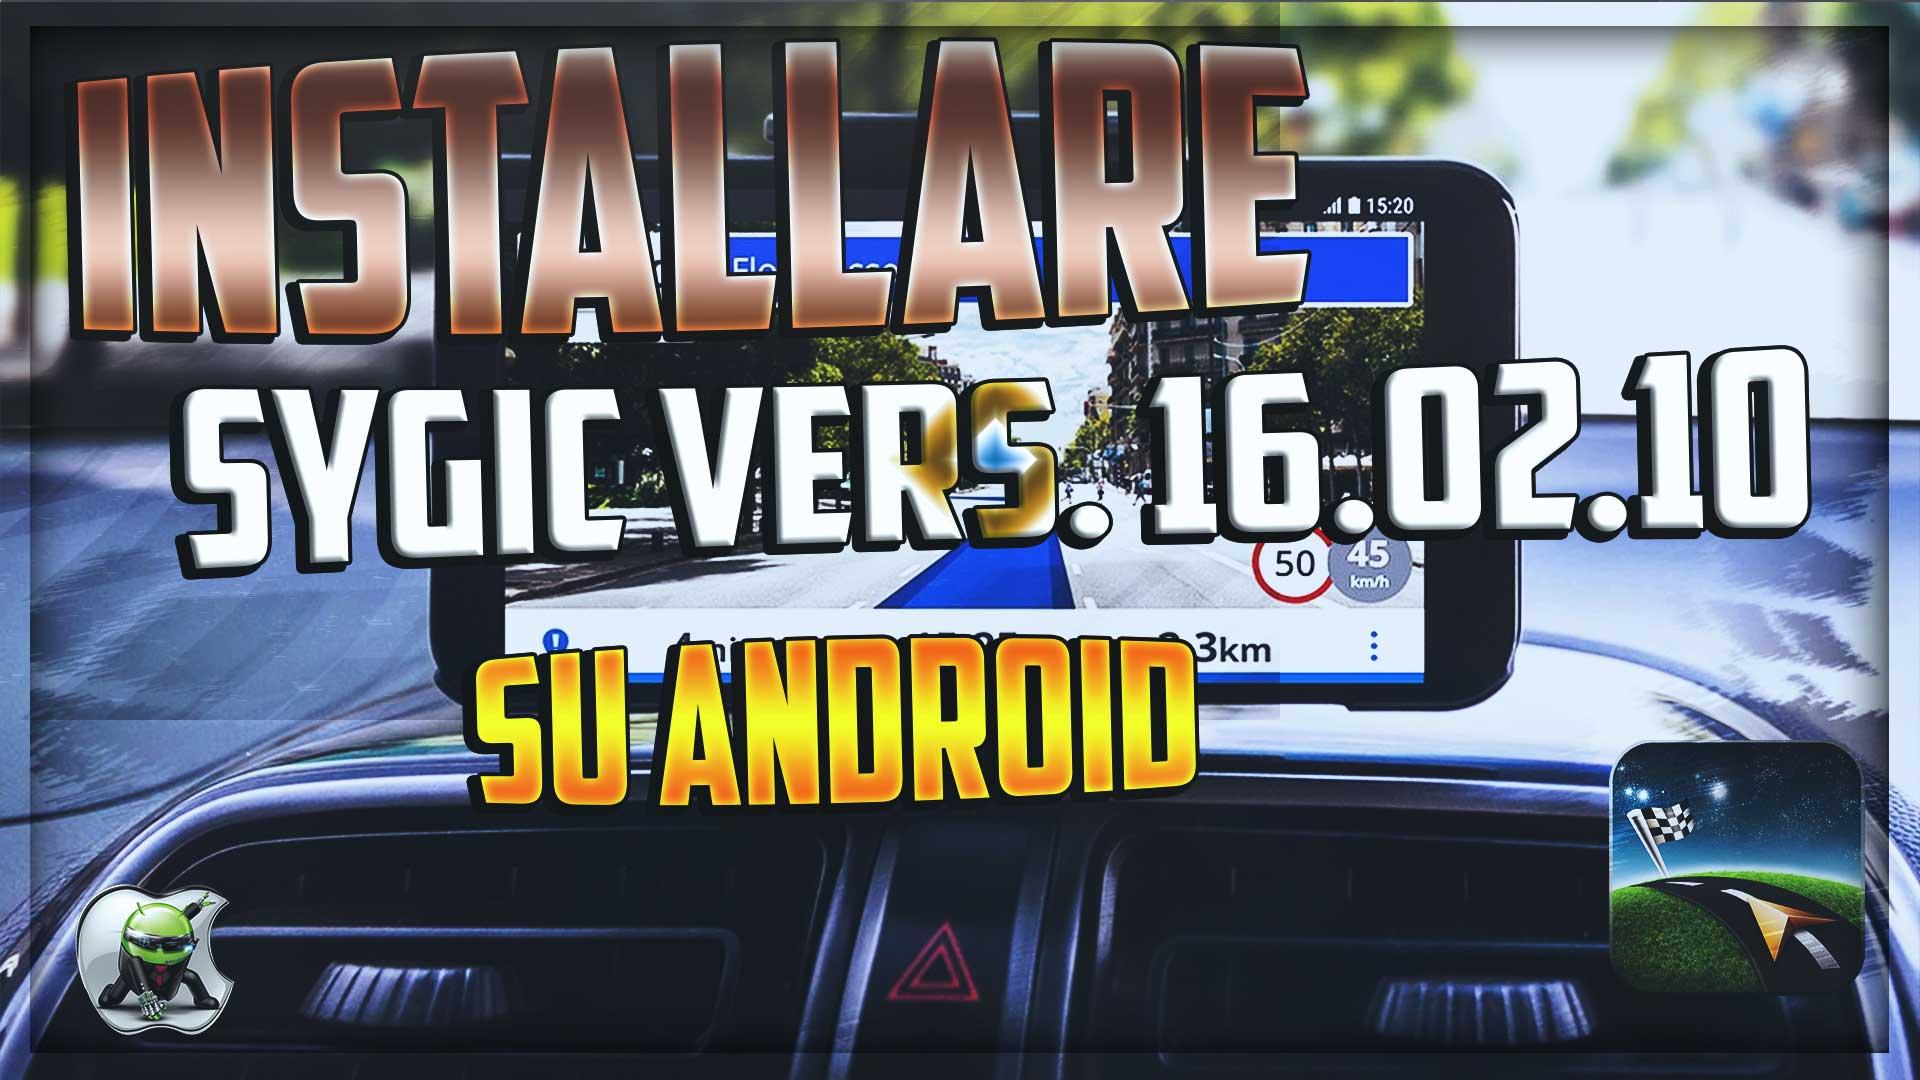 Installare Sygic v16.2.10 su Android